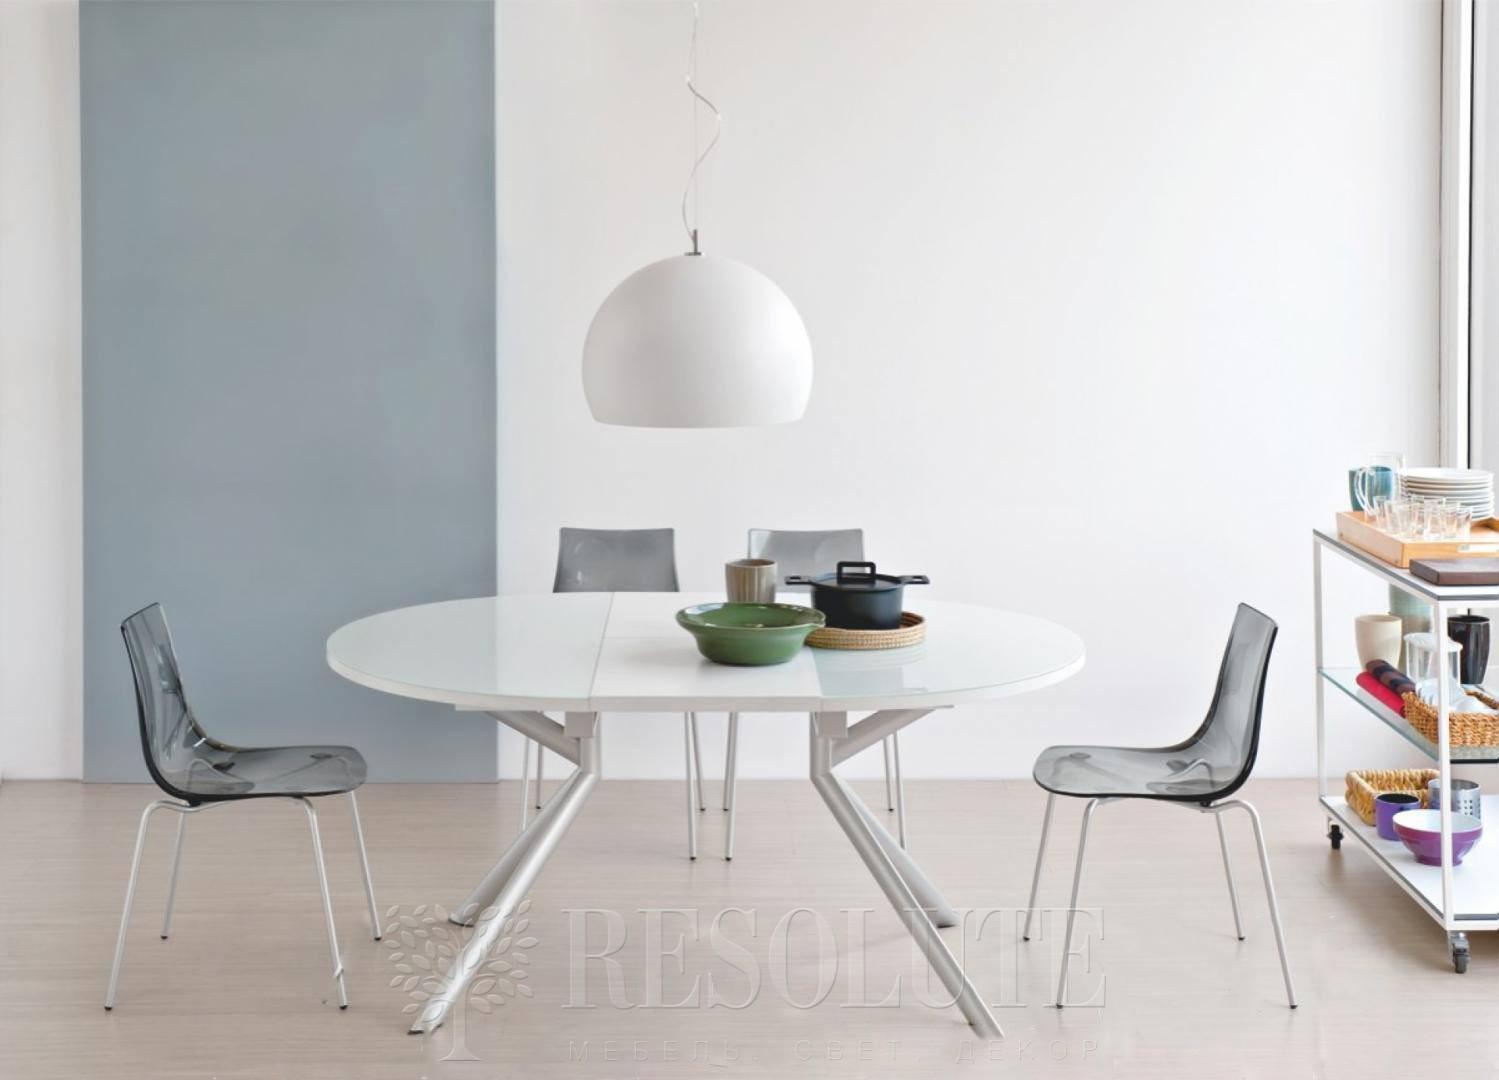 Стол металлический со стеклом Olivo&Godeassi G/4738 Meteor - 1